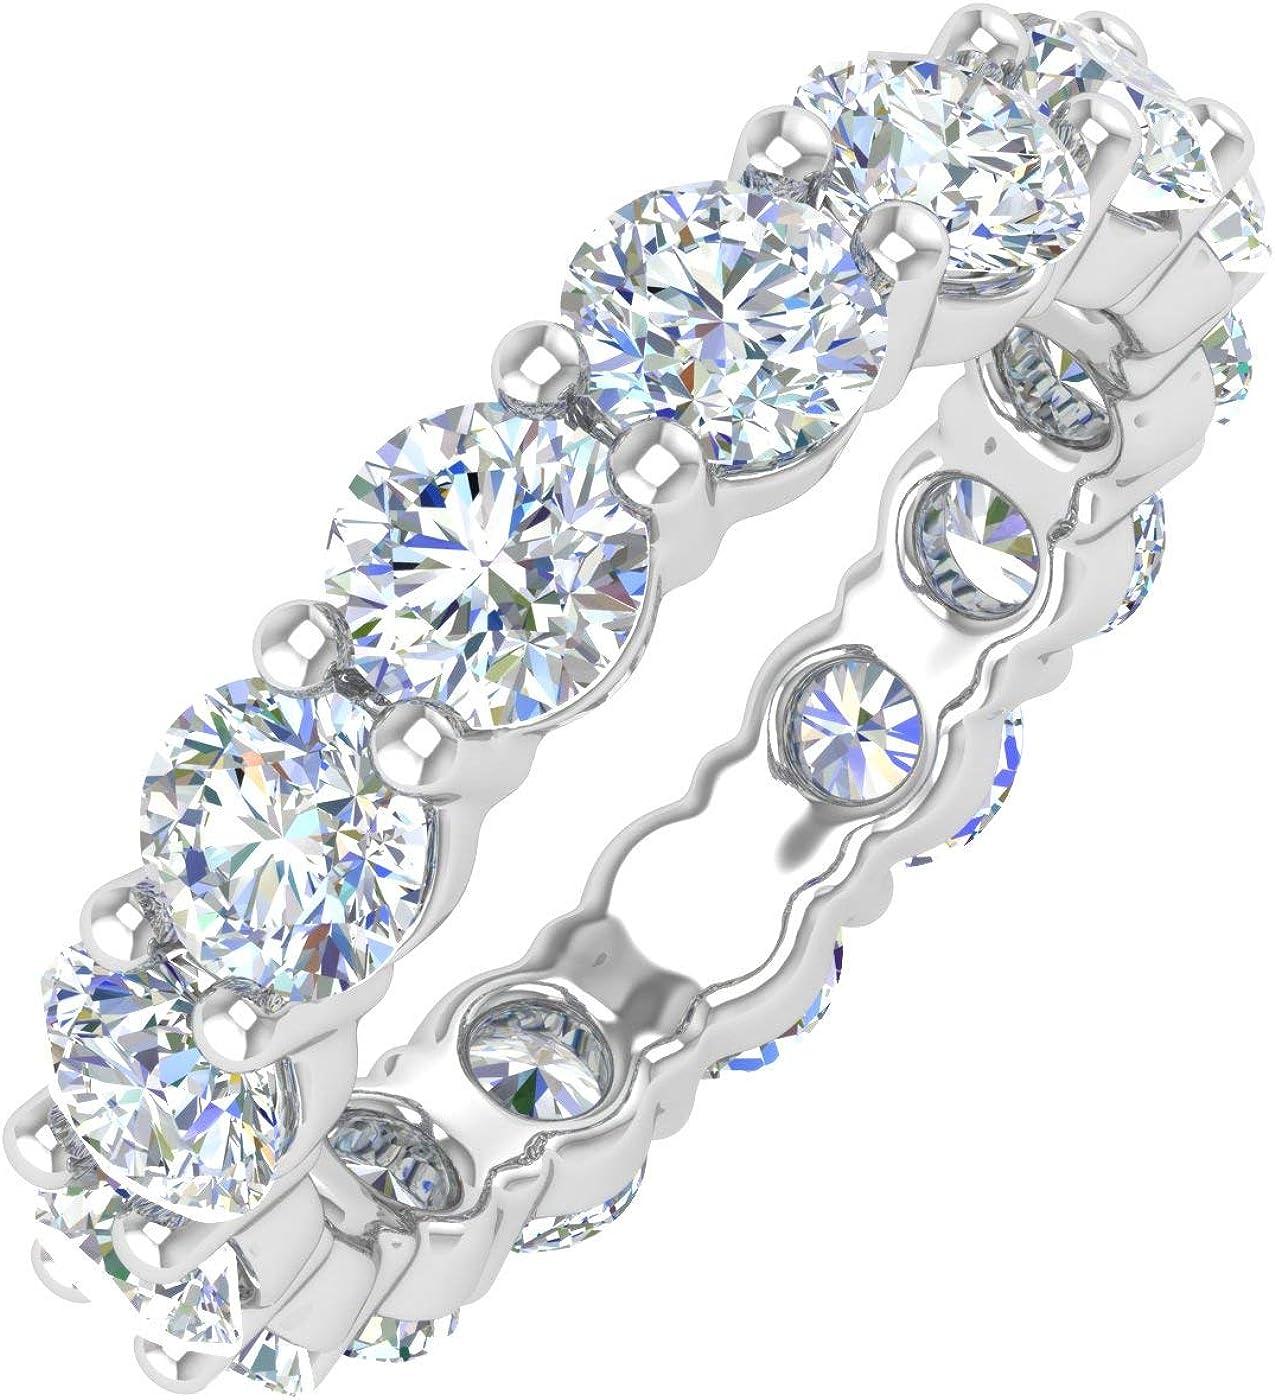 5 Carat Diamond Eternity Wedding バースデー 記念日 ギフト 贈物 お勧め 通販 Band ショップ Ring Cer IGI Gold in - 14K